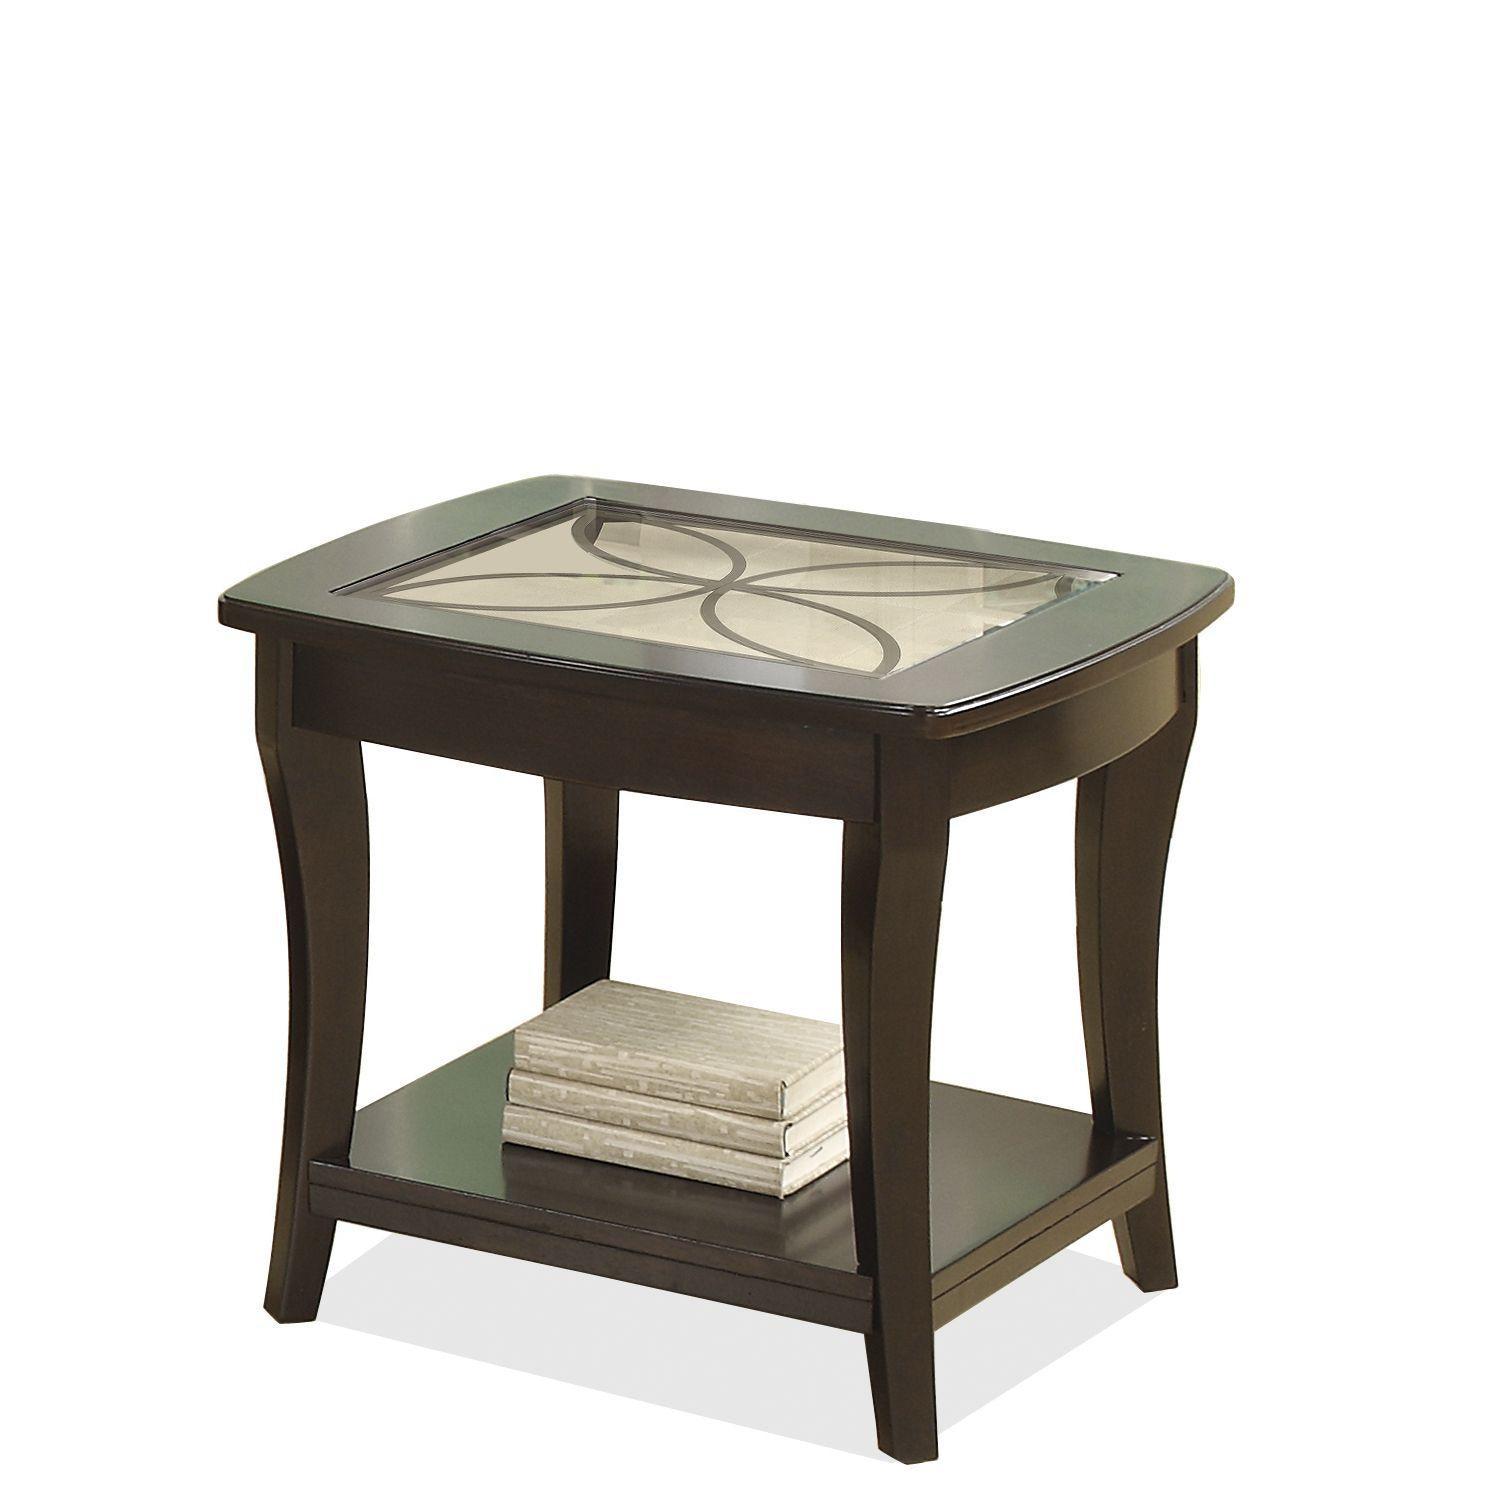 ron fiore century furniture. fiore furniture riverside side table 12406 a inside decor ron century